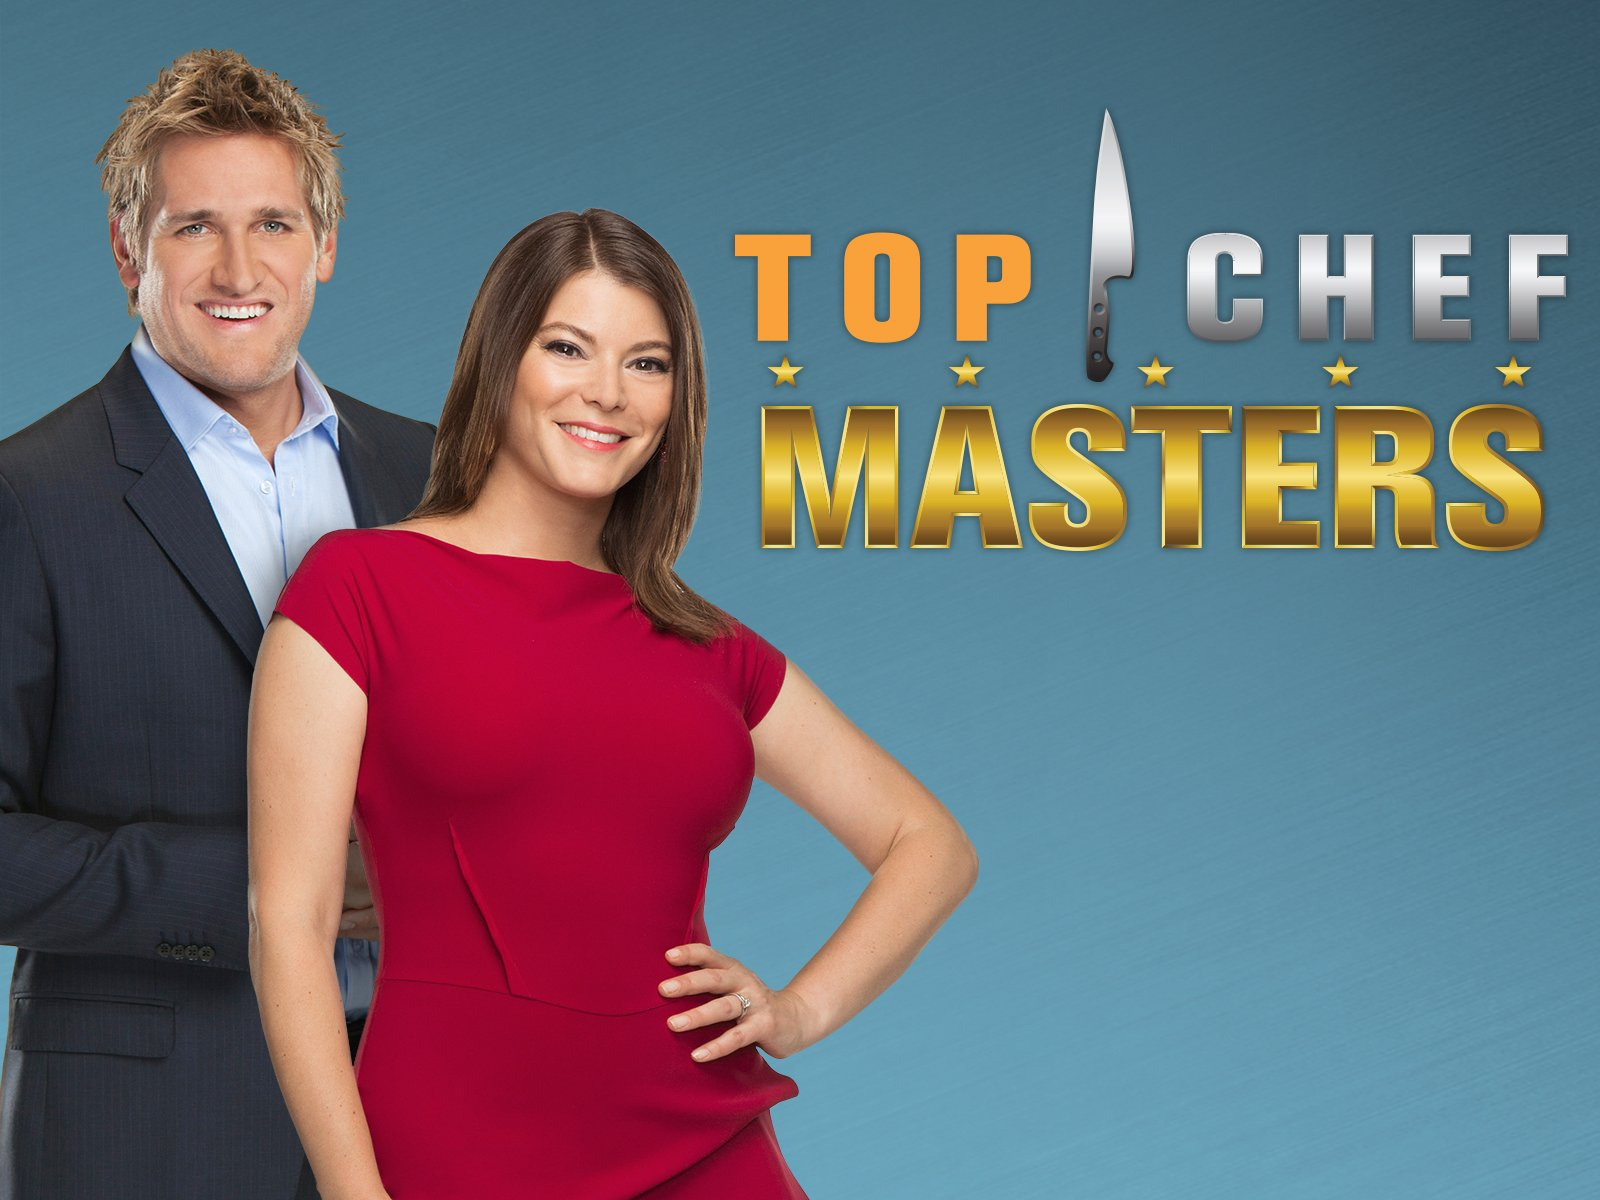 Amazon.com: Top Chef Masters Season 5: Amazon Digital Services LLC